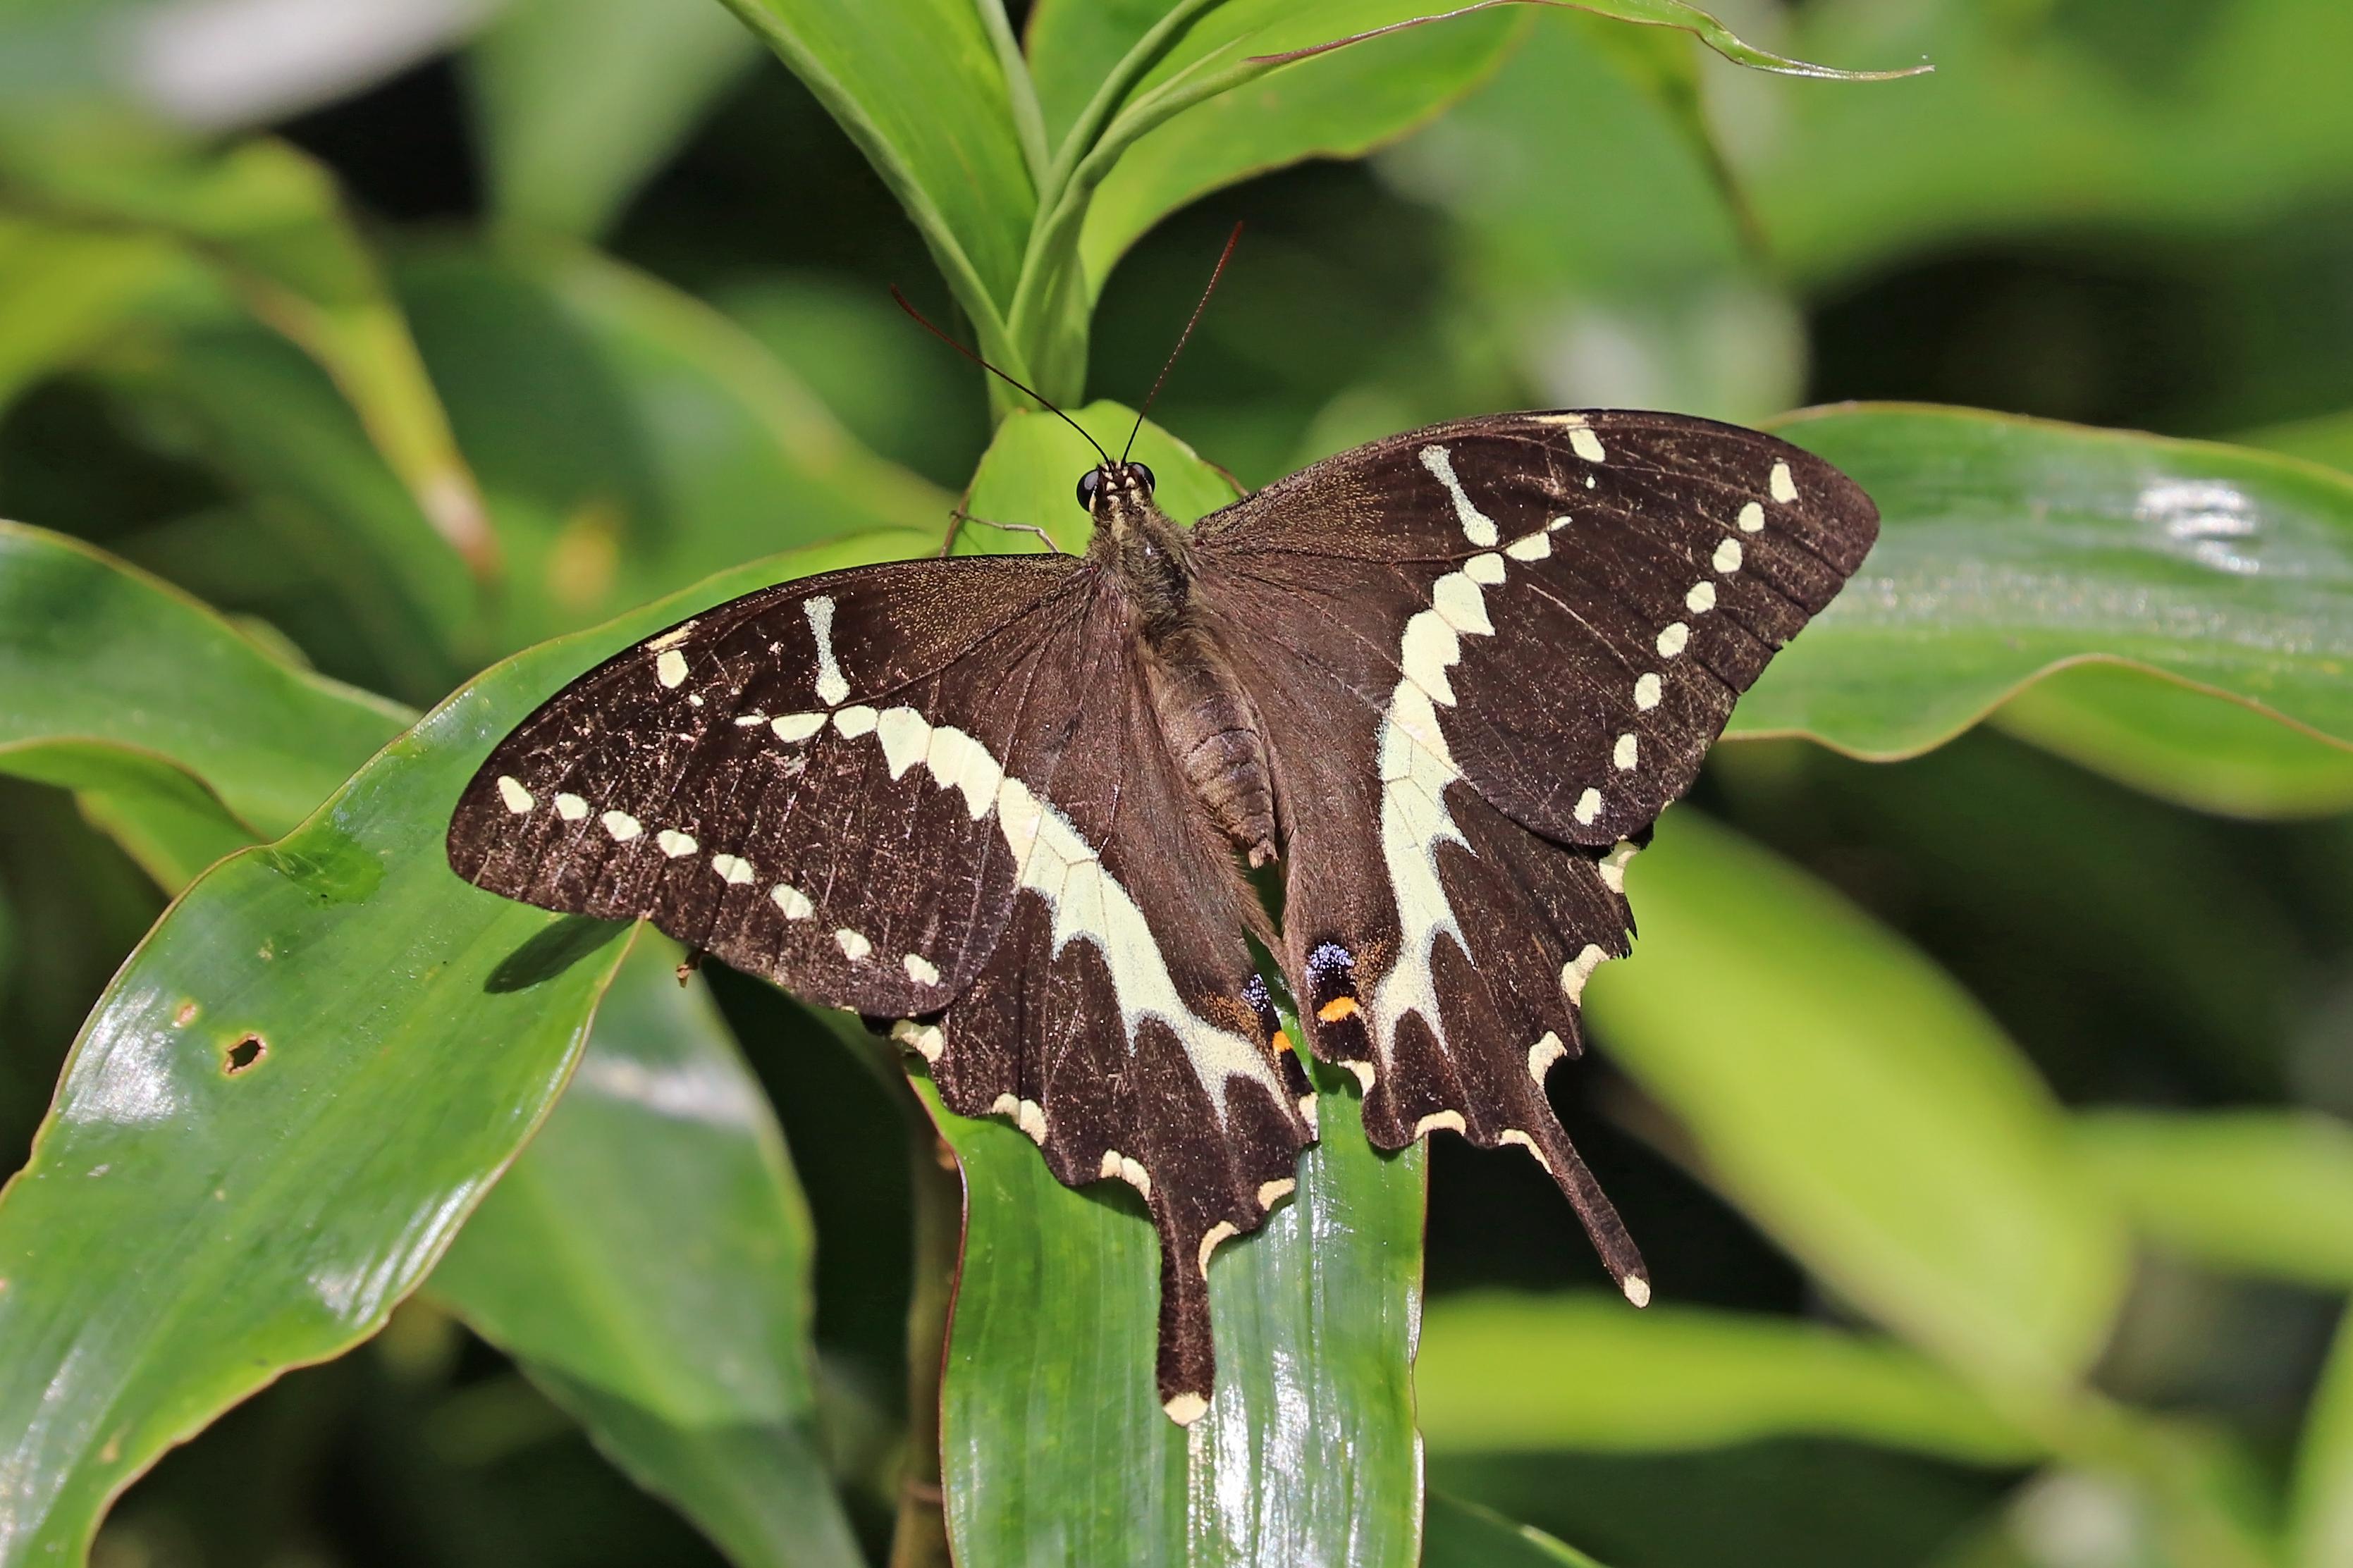 Sưu tập Bộ cánh vẩy 2 - Page 66 Swallowtail_%28Papilio_mangoura%29_female